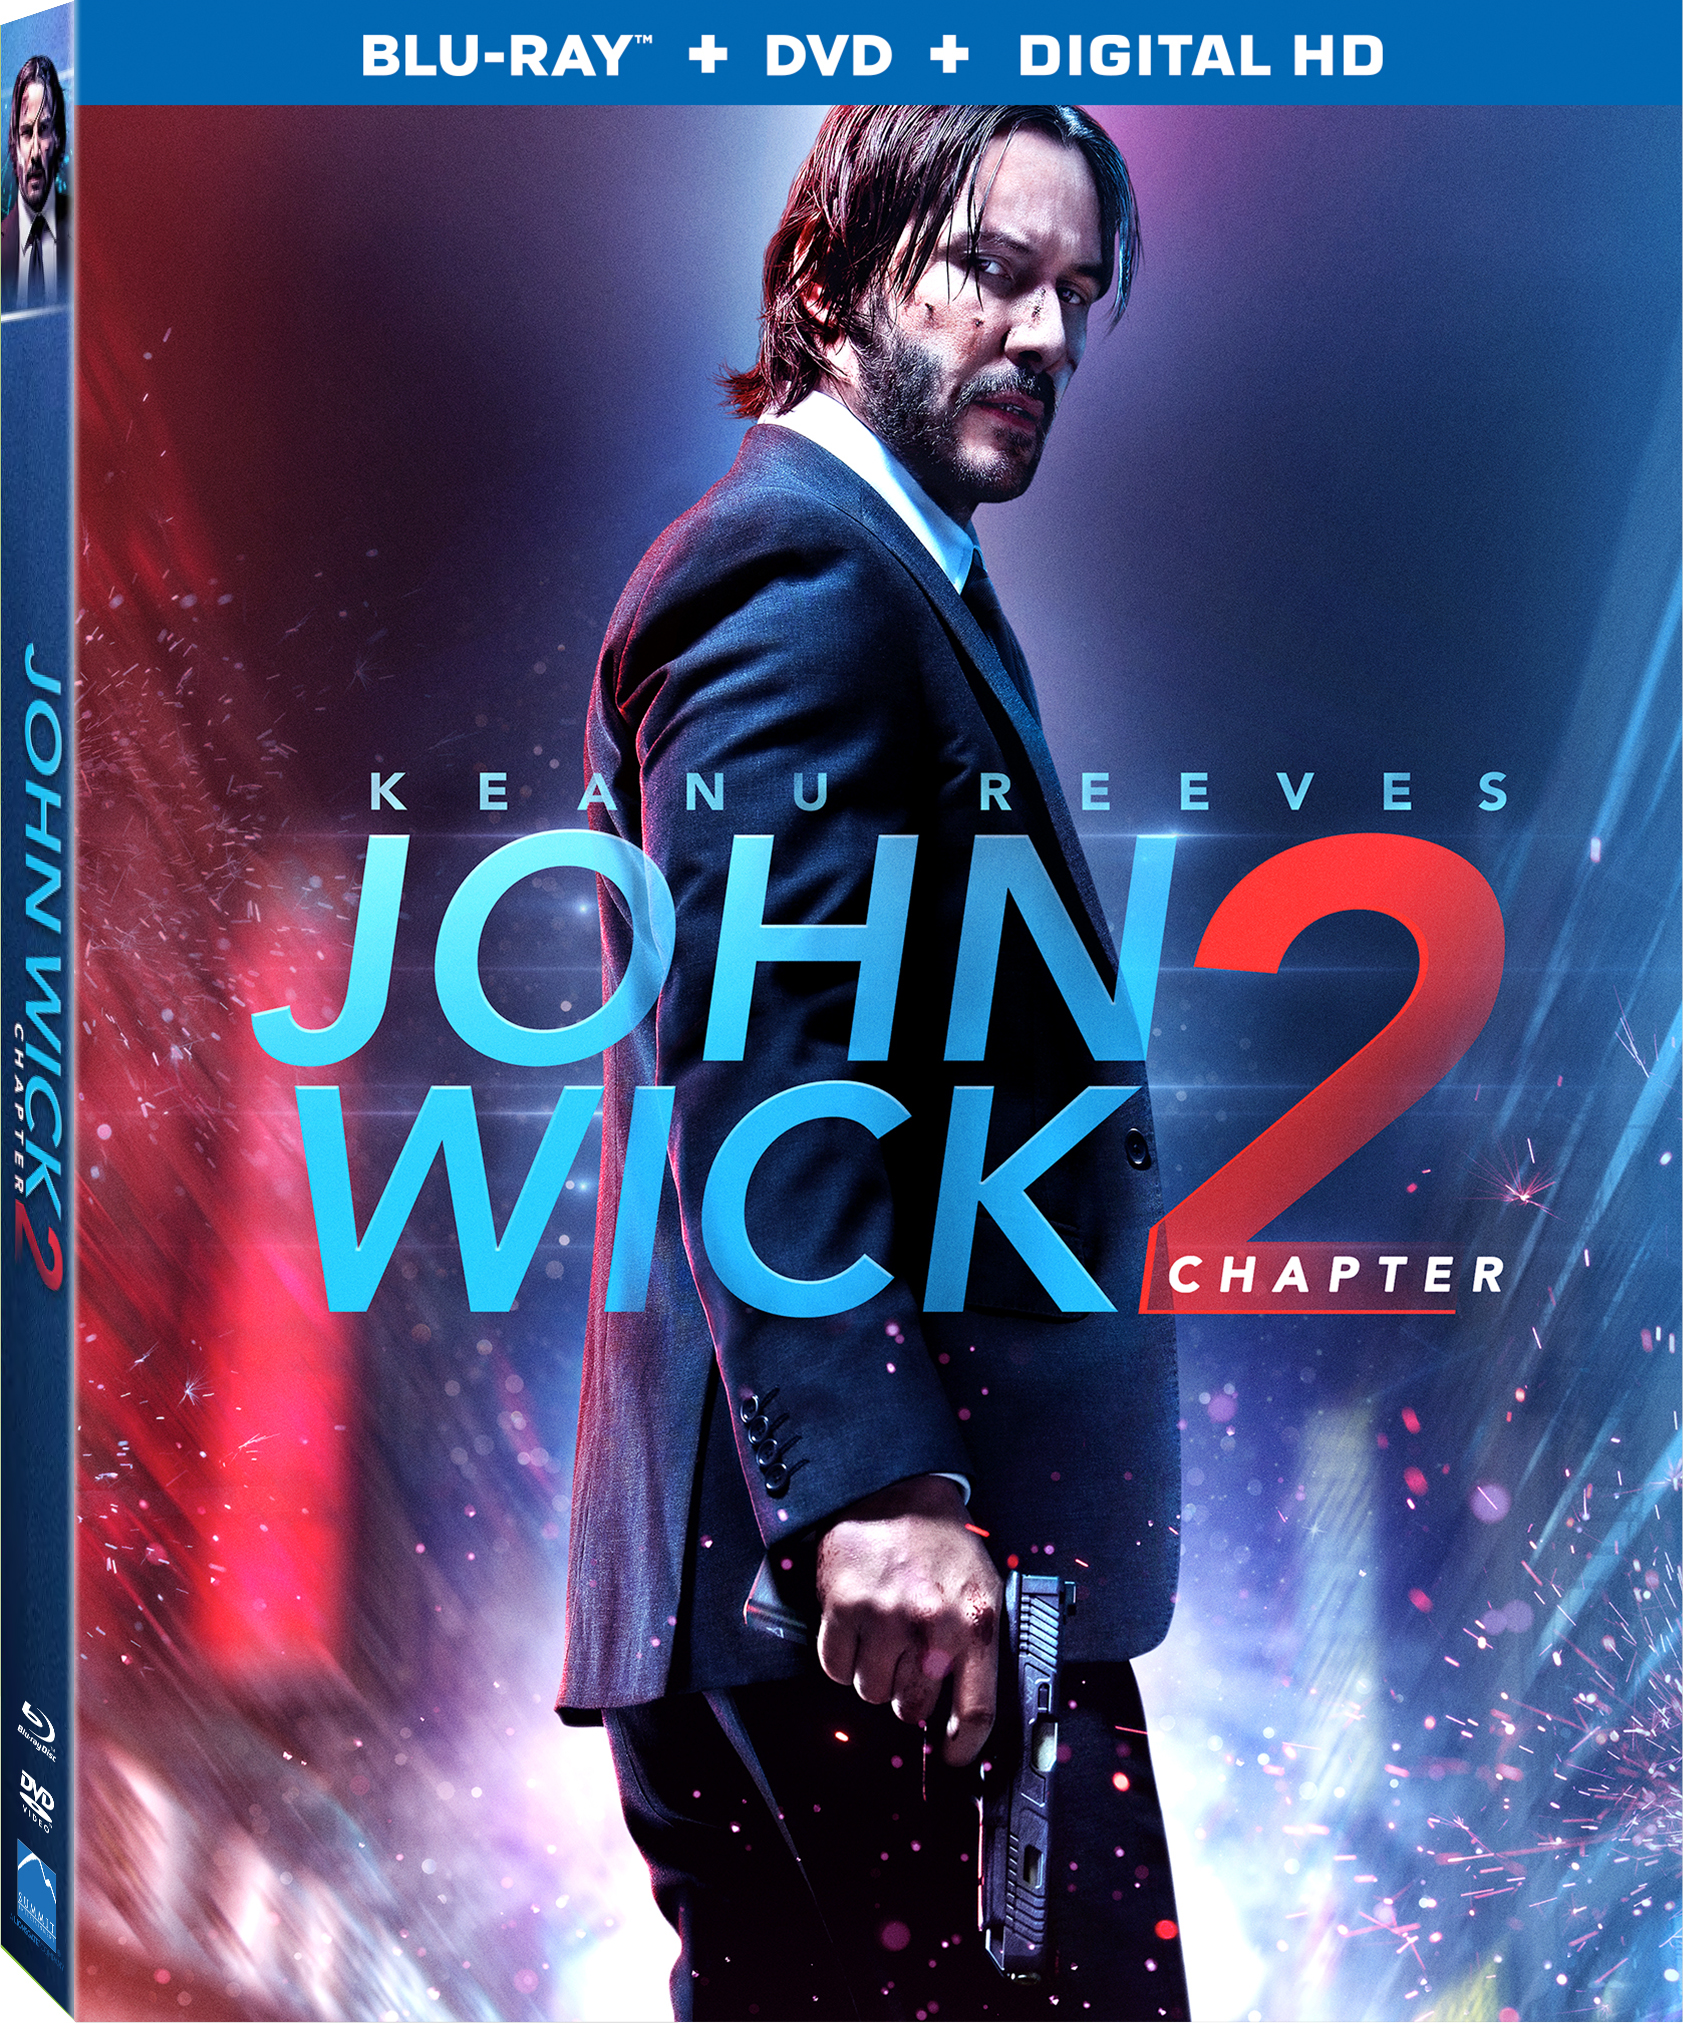 John Wick: Chapter 2 (2017) poster image